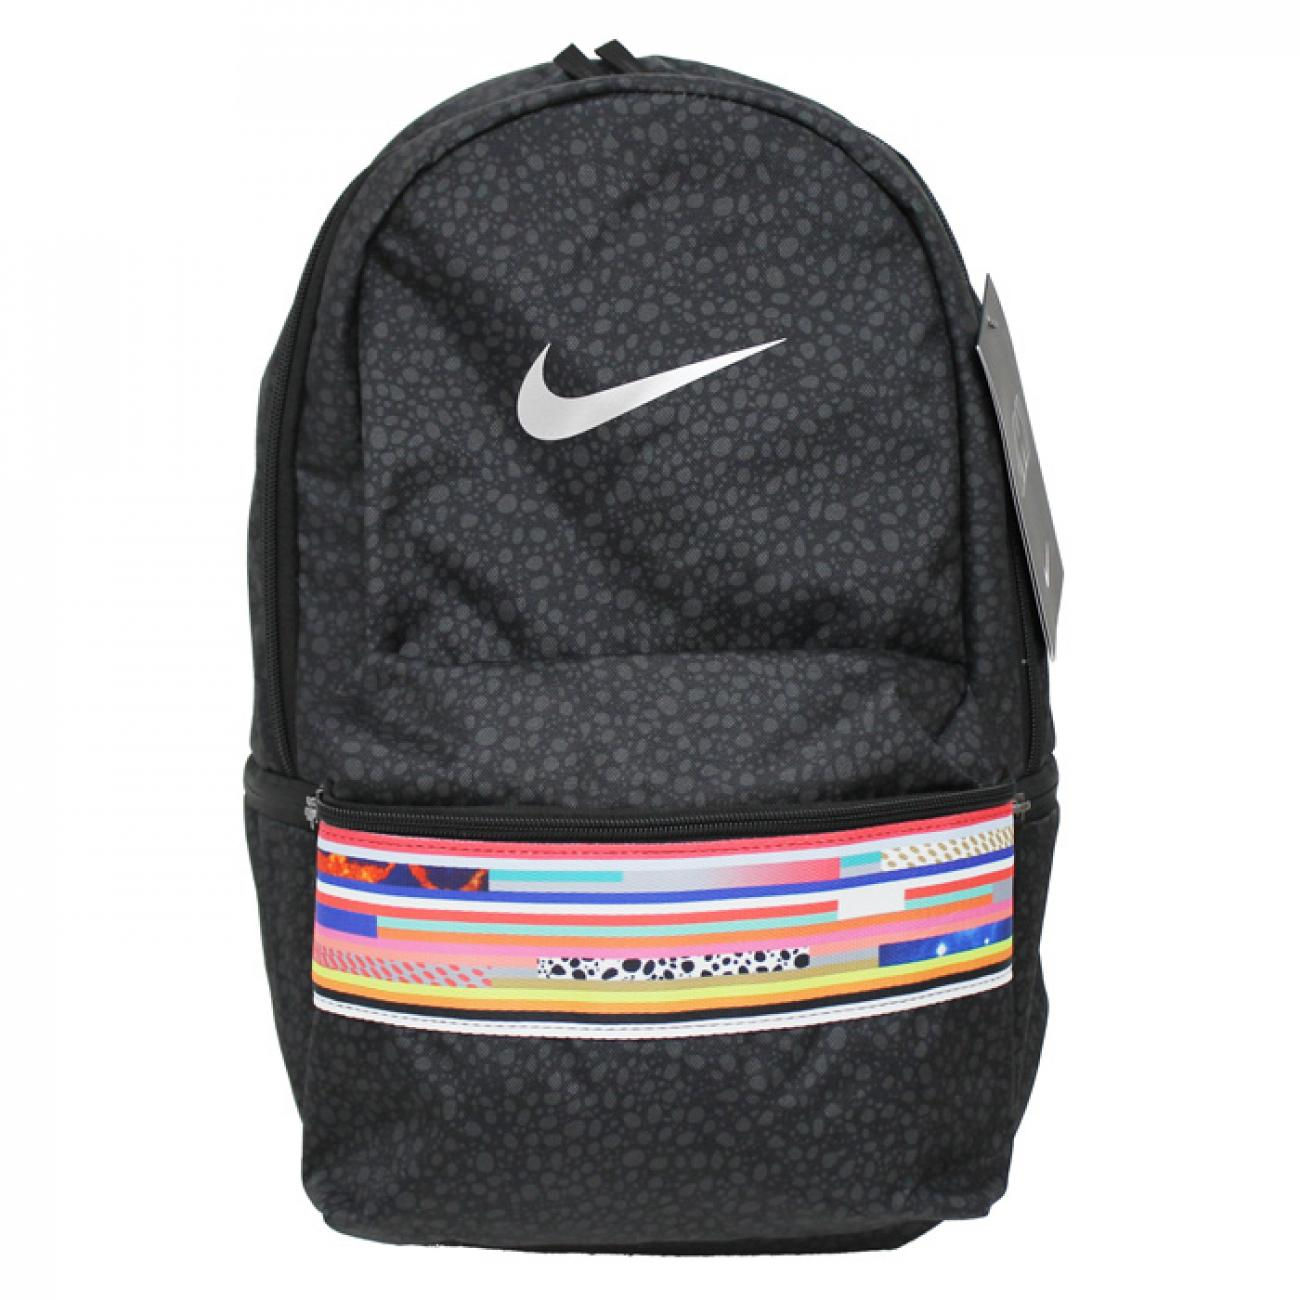 Nike Mercurial CR7 Backpack